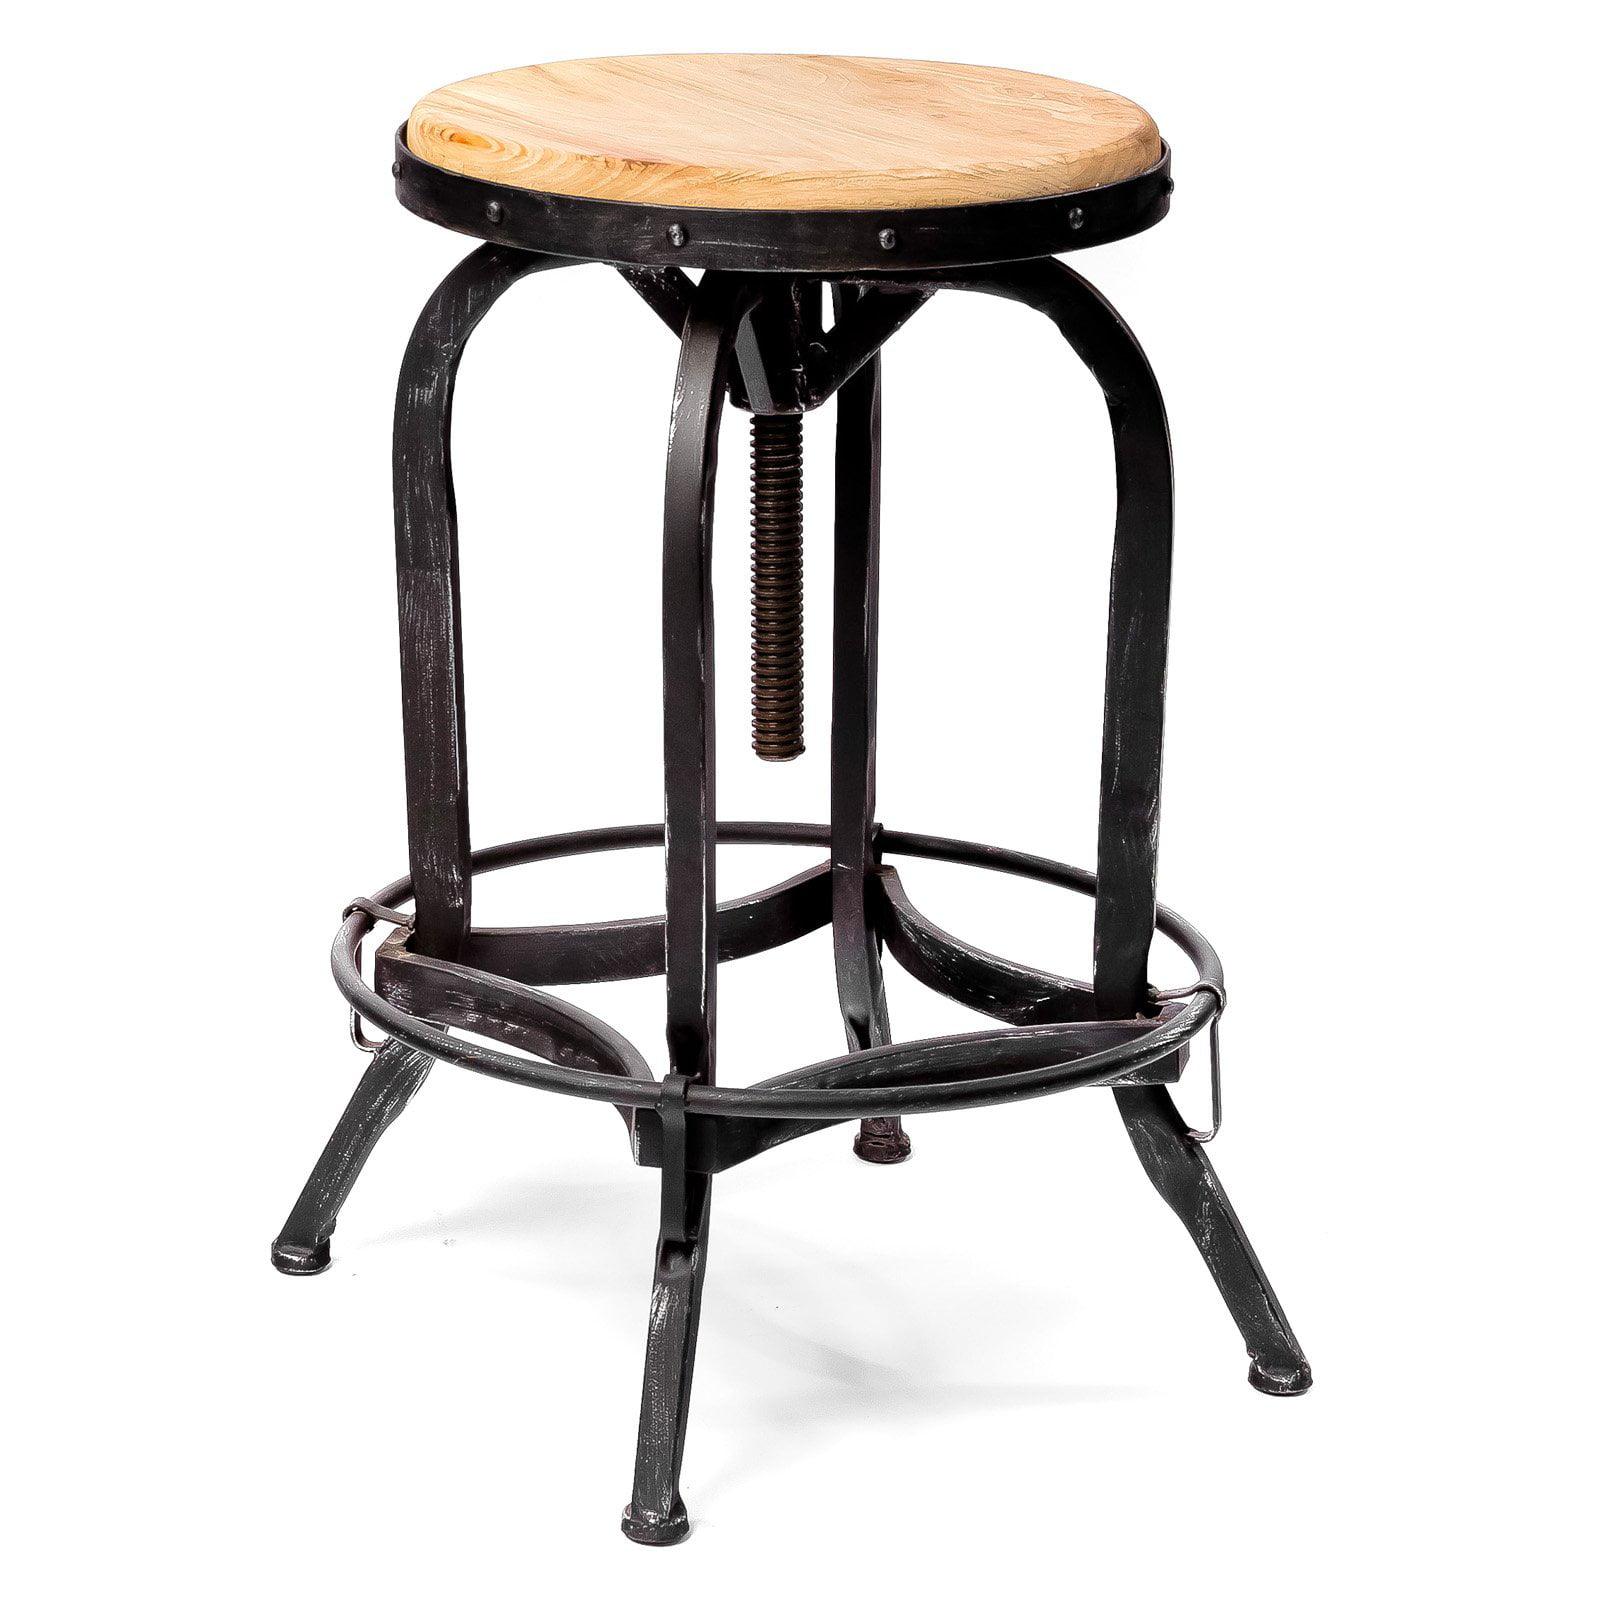 Farmdale Industrial Adjustable Swivel Bar Stool Natural Antique Black – Christopher Knight Home